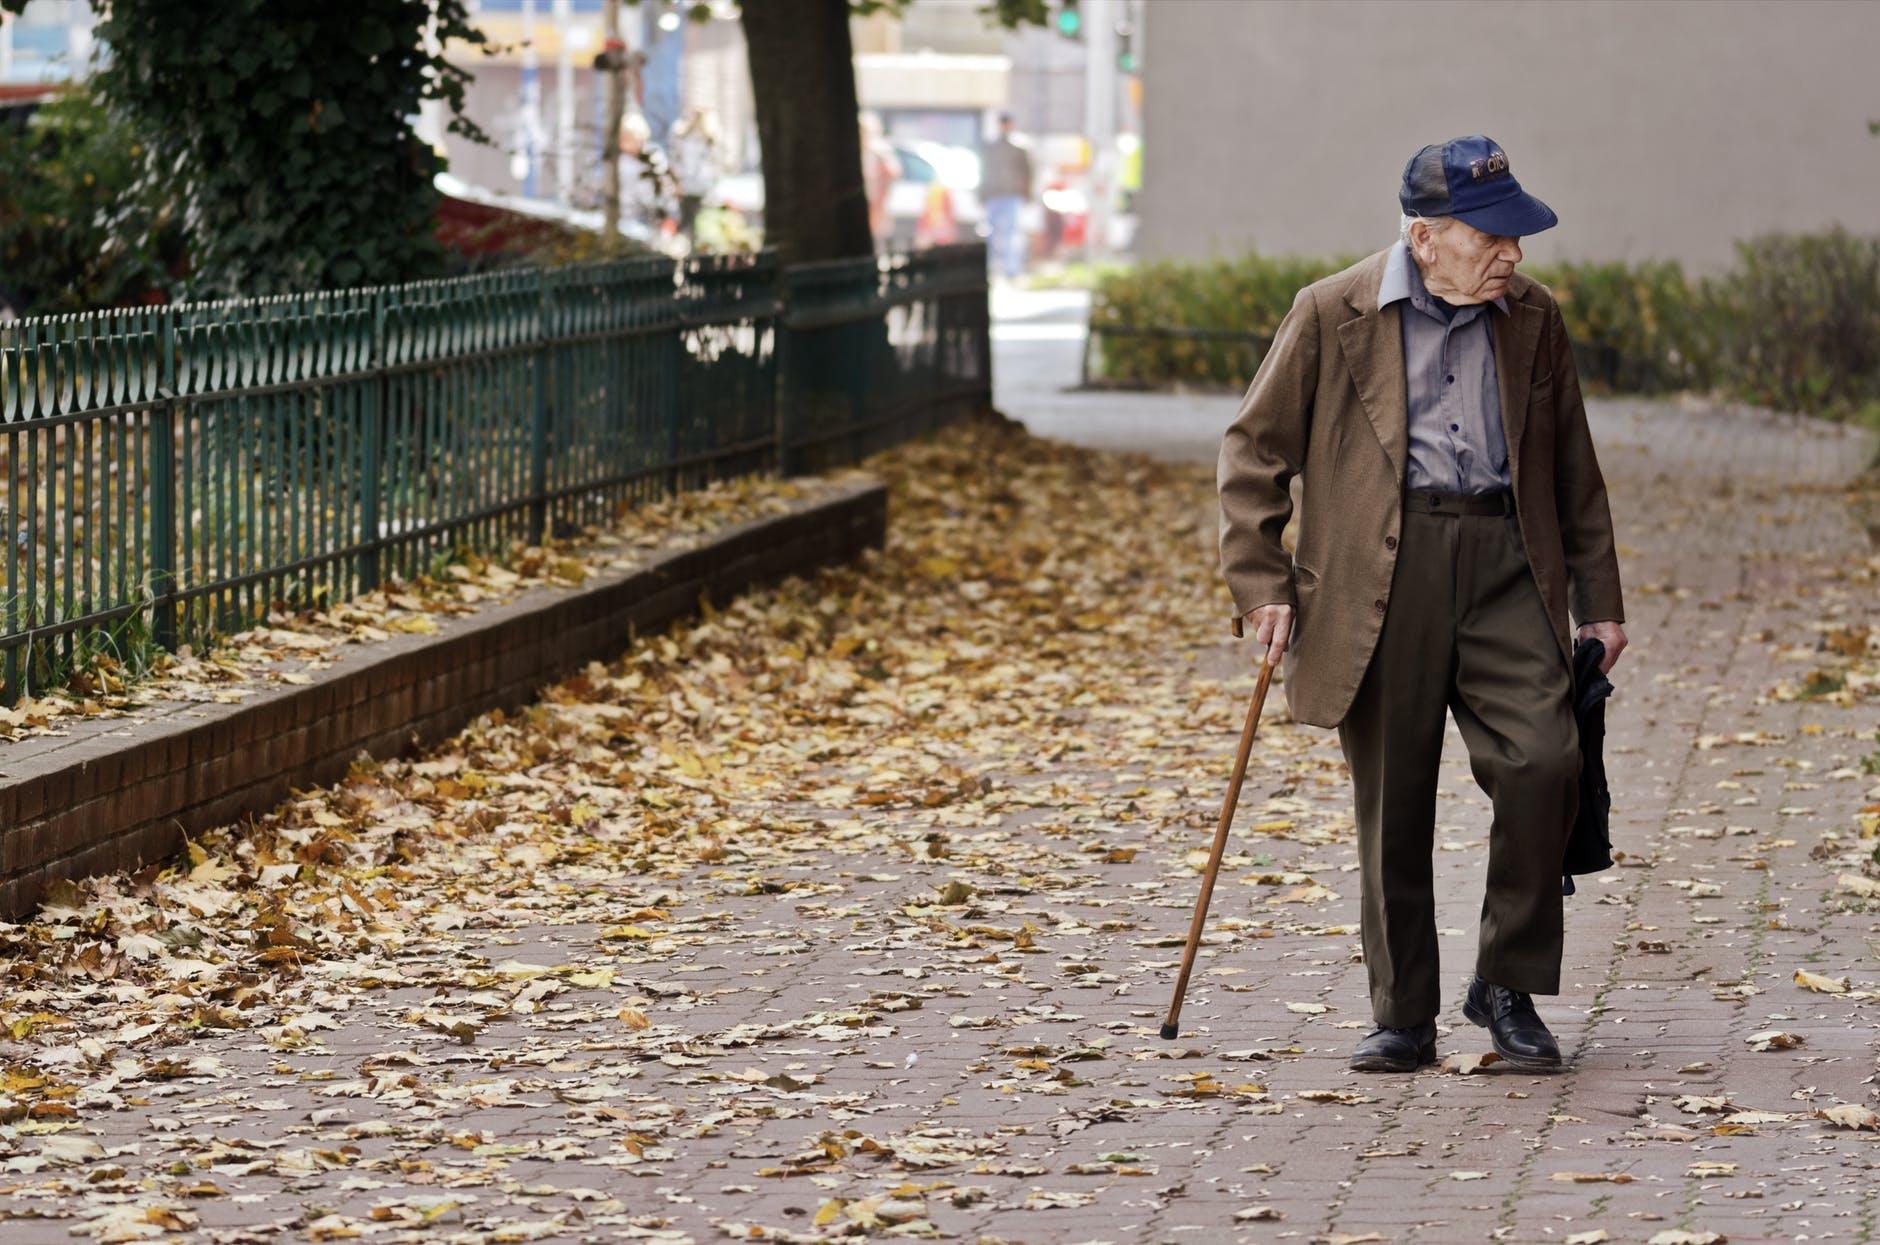 photo of elderly man walking on pavement